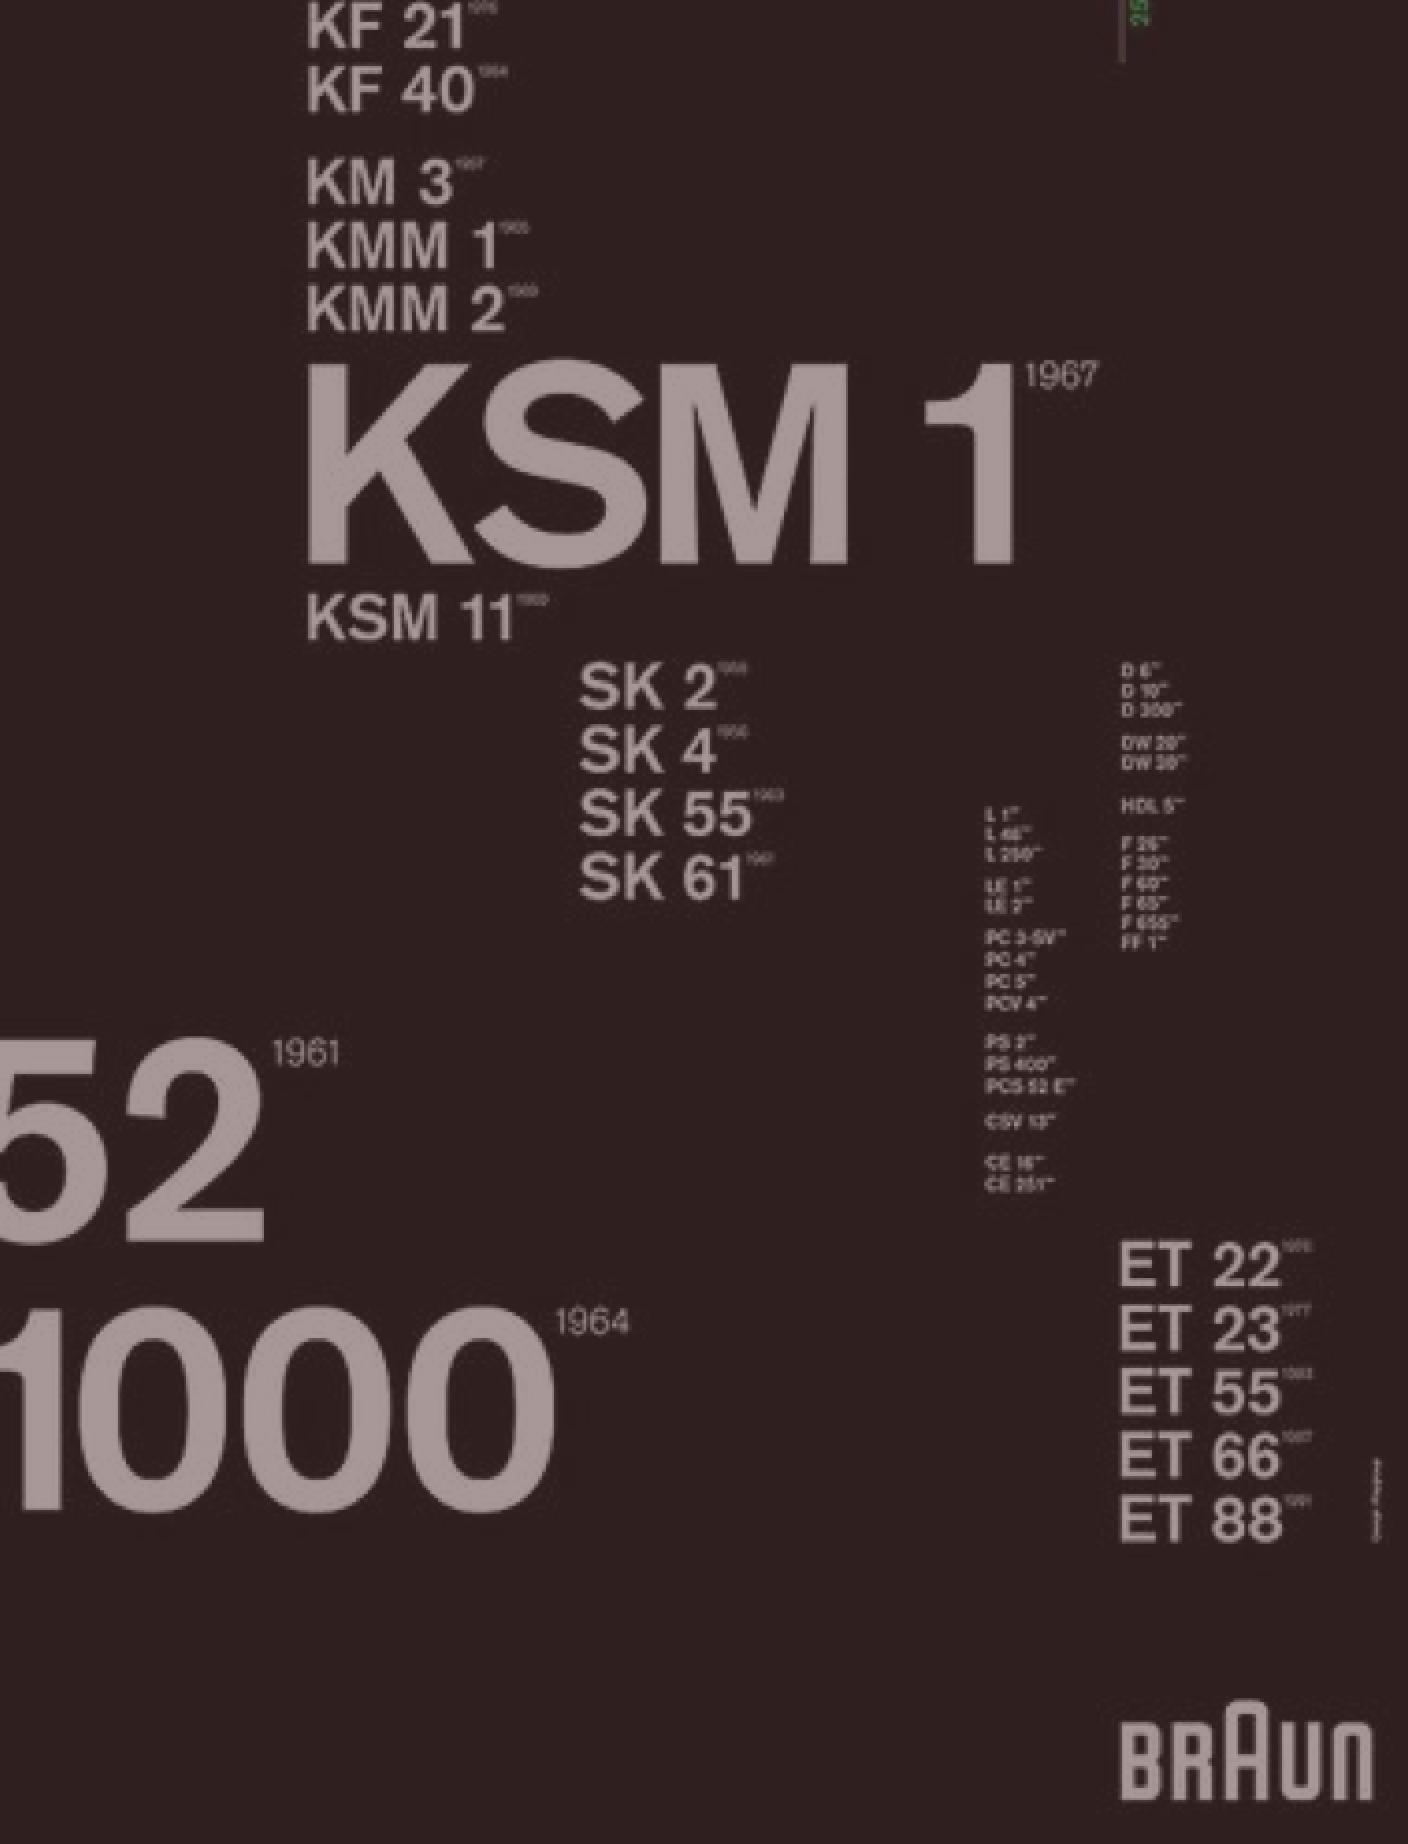 About KSM wallpaper